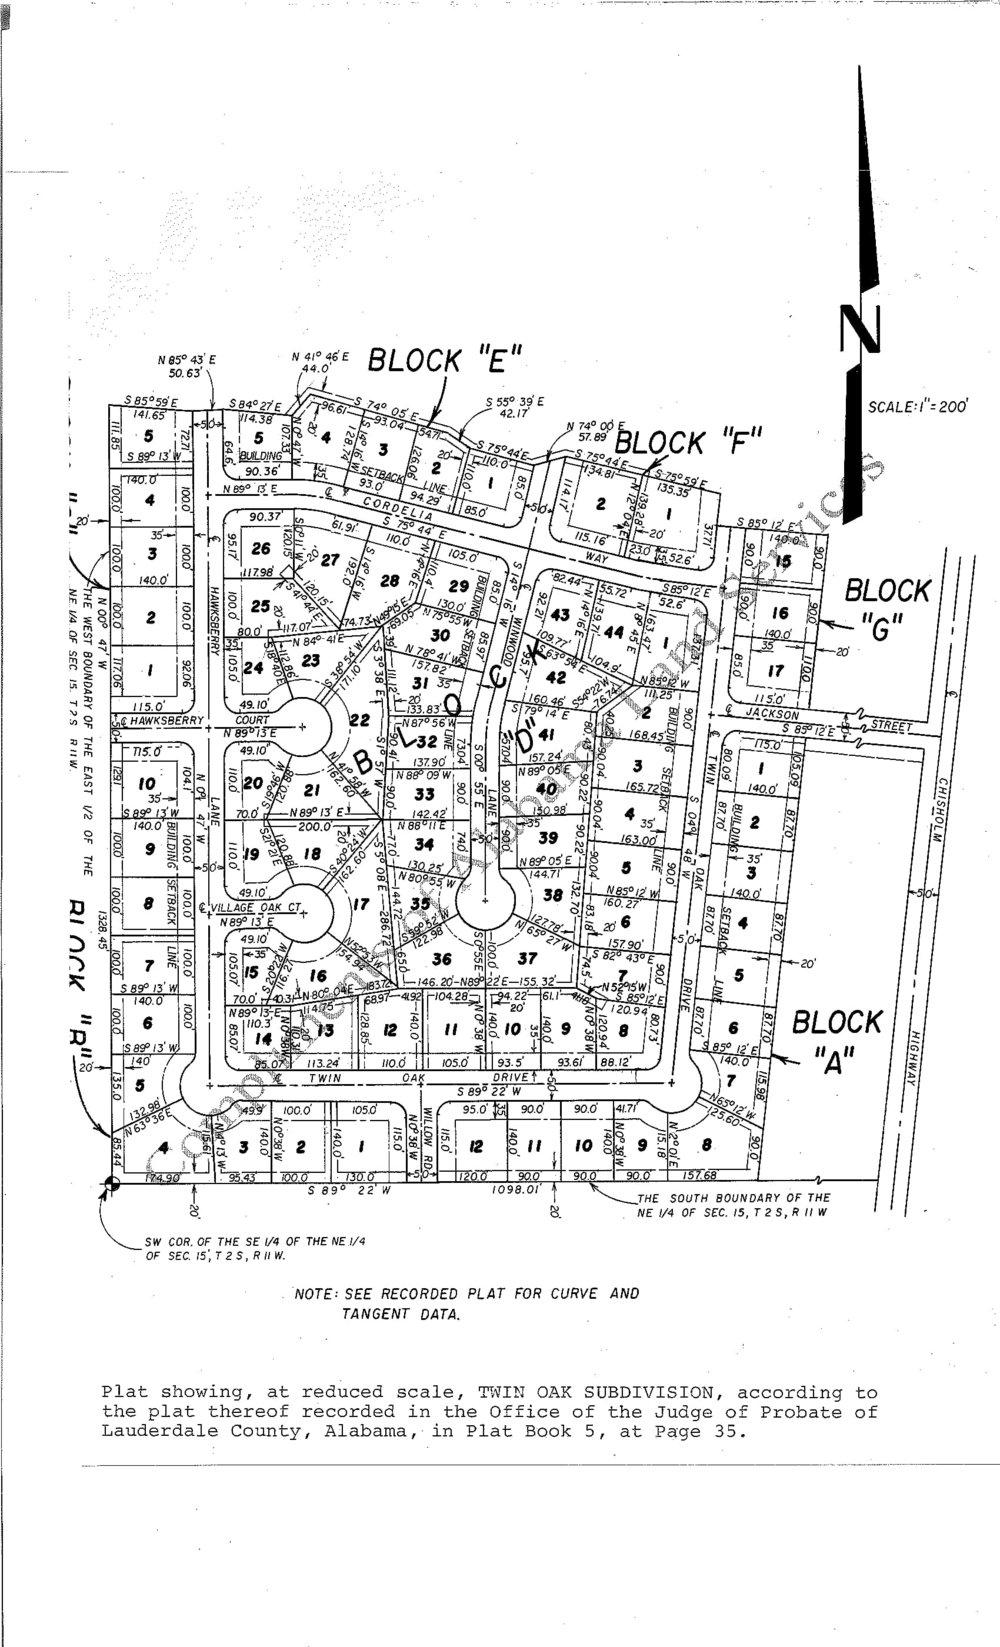 Plat-Twin-Oak-Subdivision-1.jpg